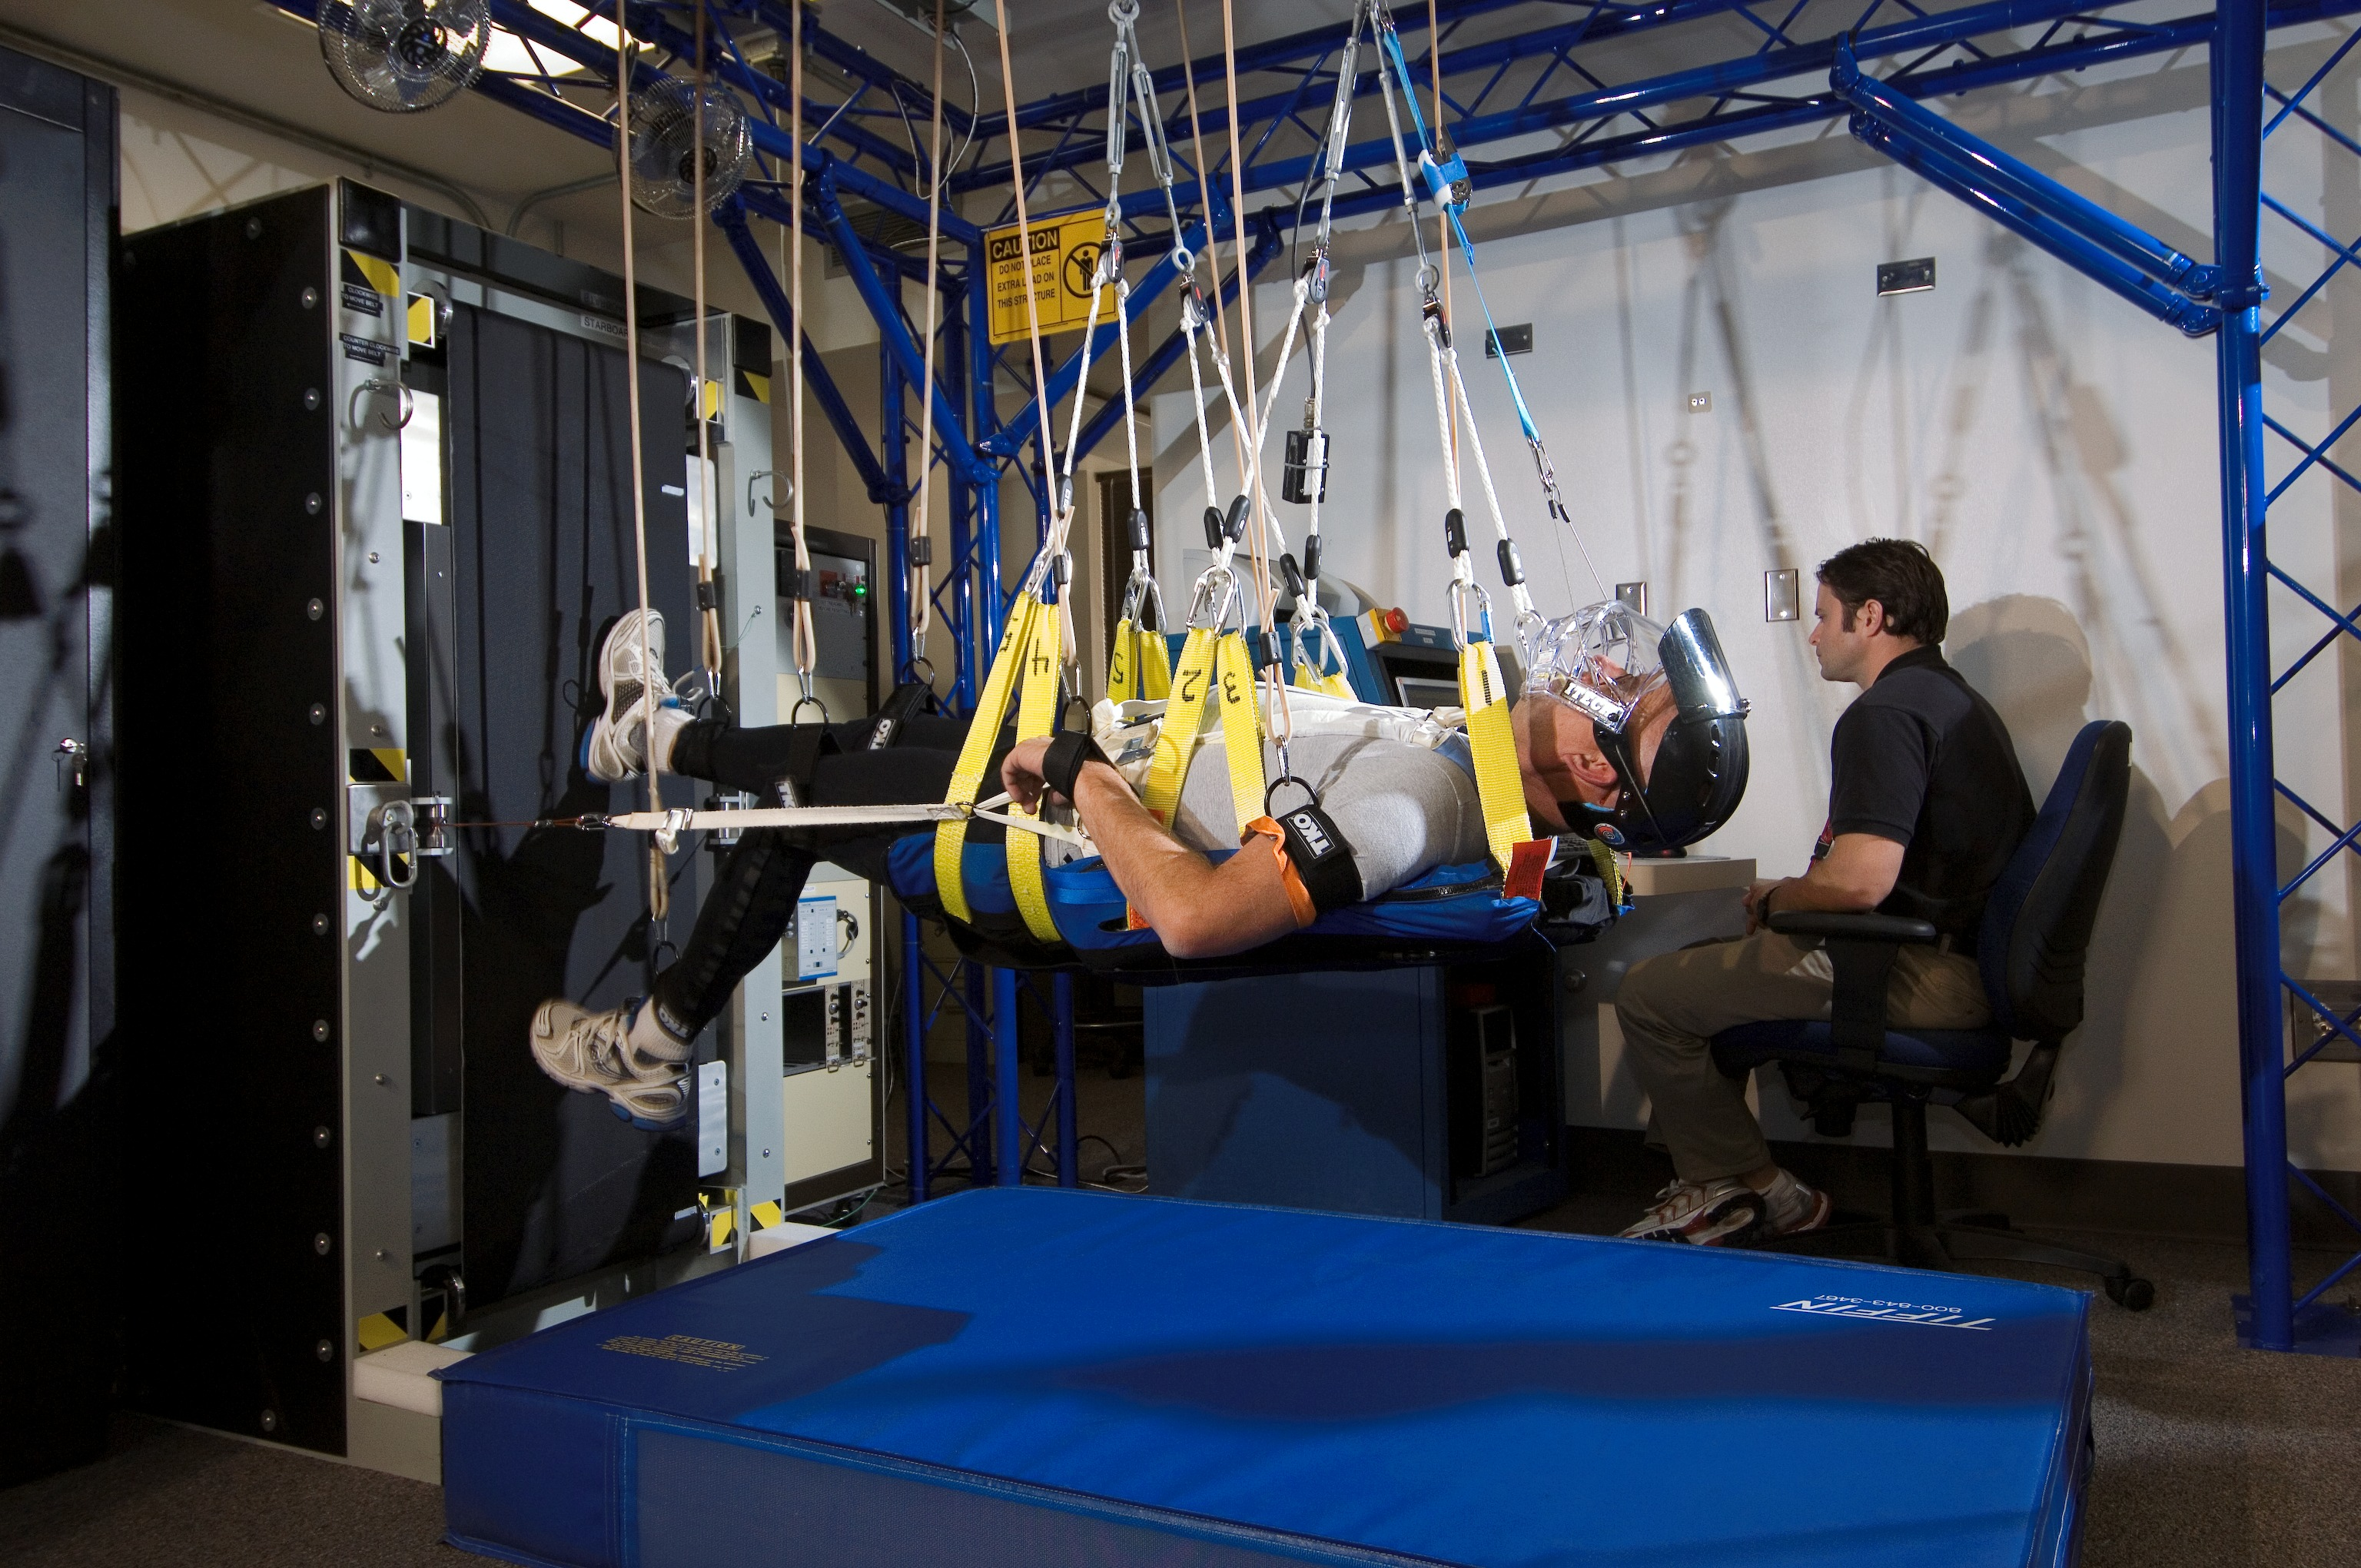 Bedrest Exercise Treadmill Nasa